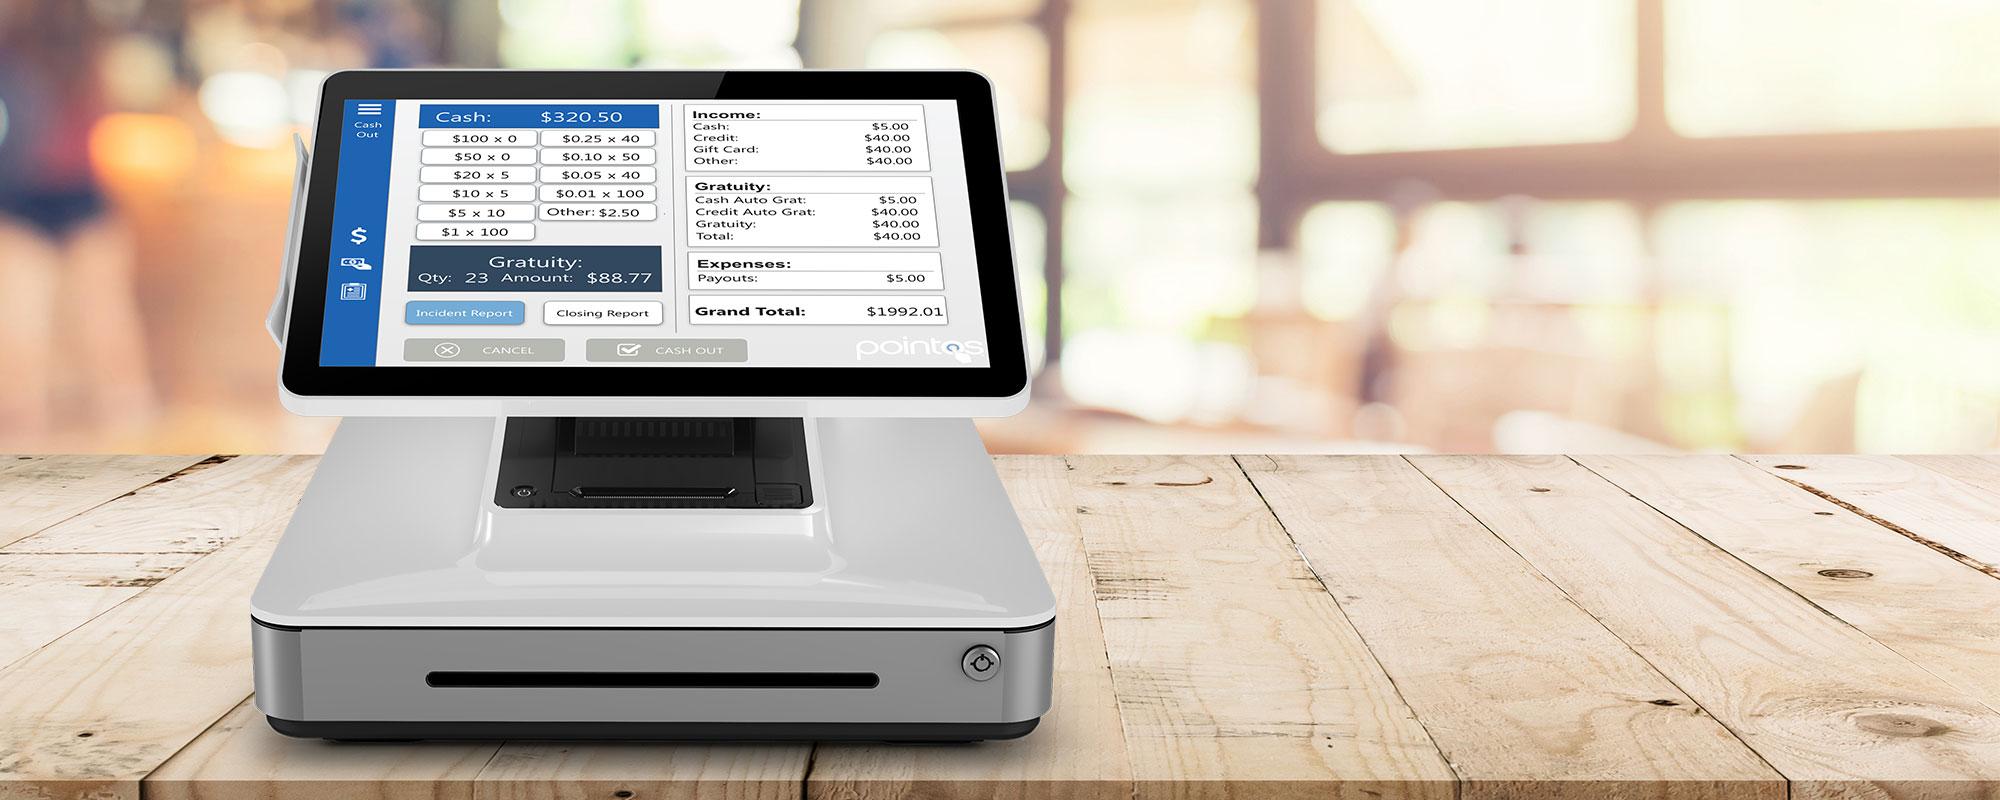 PointOS-Cash Out feature image